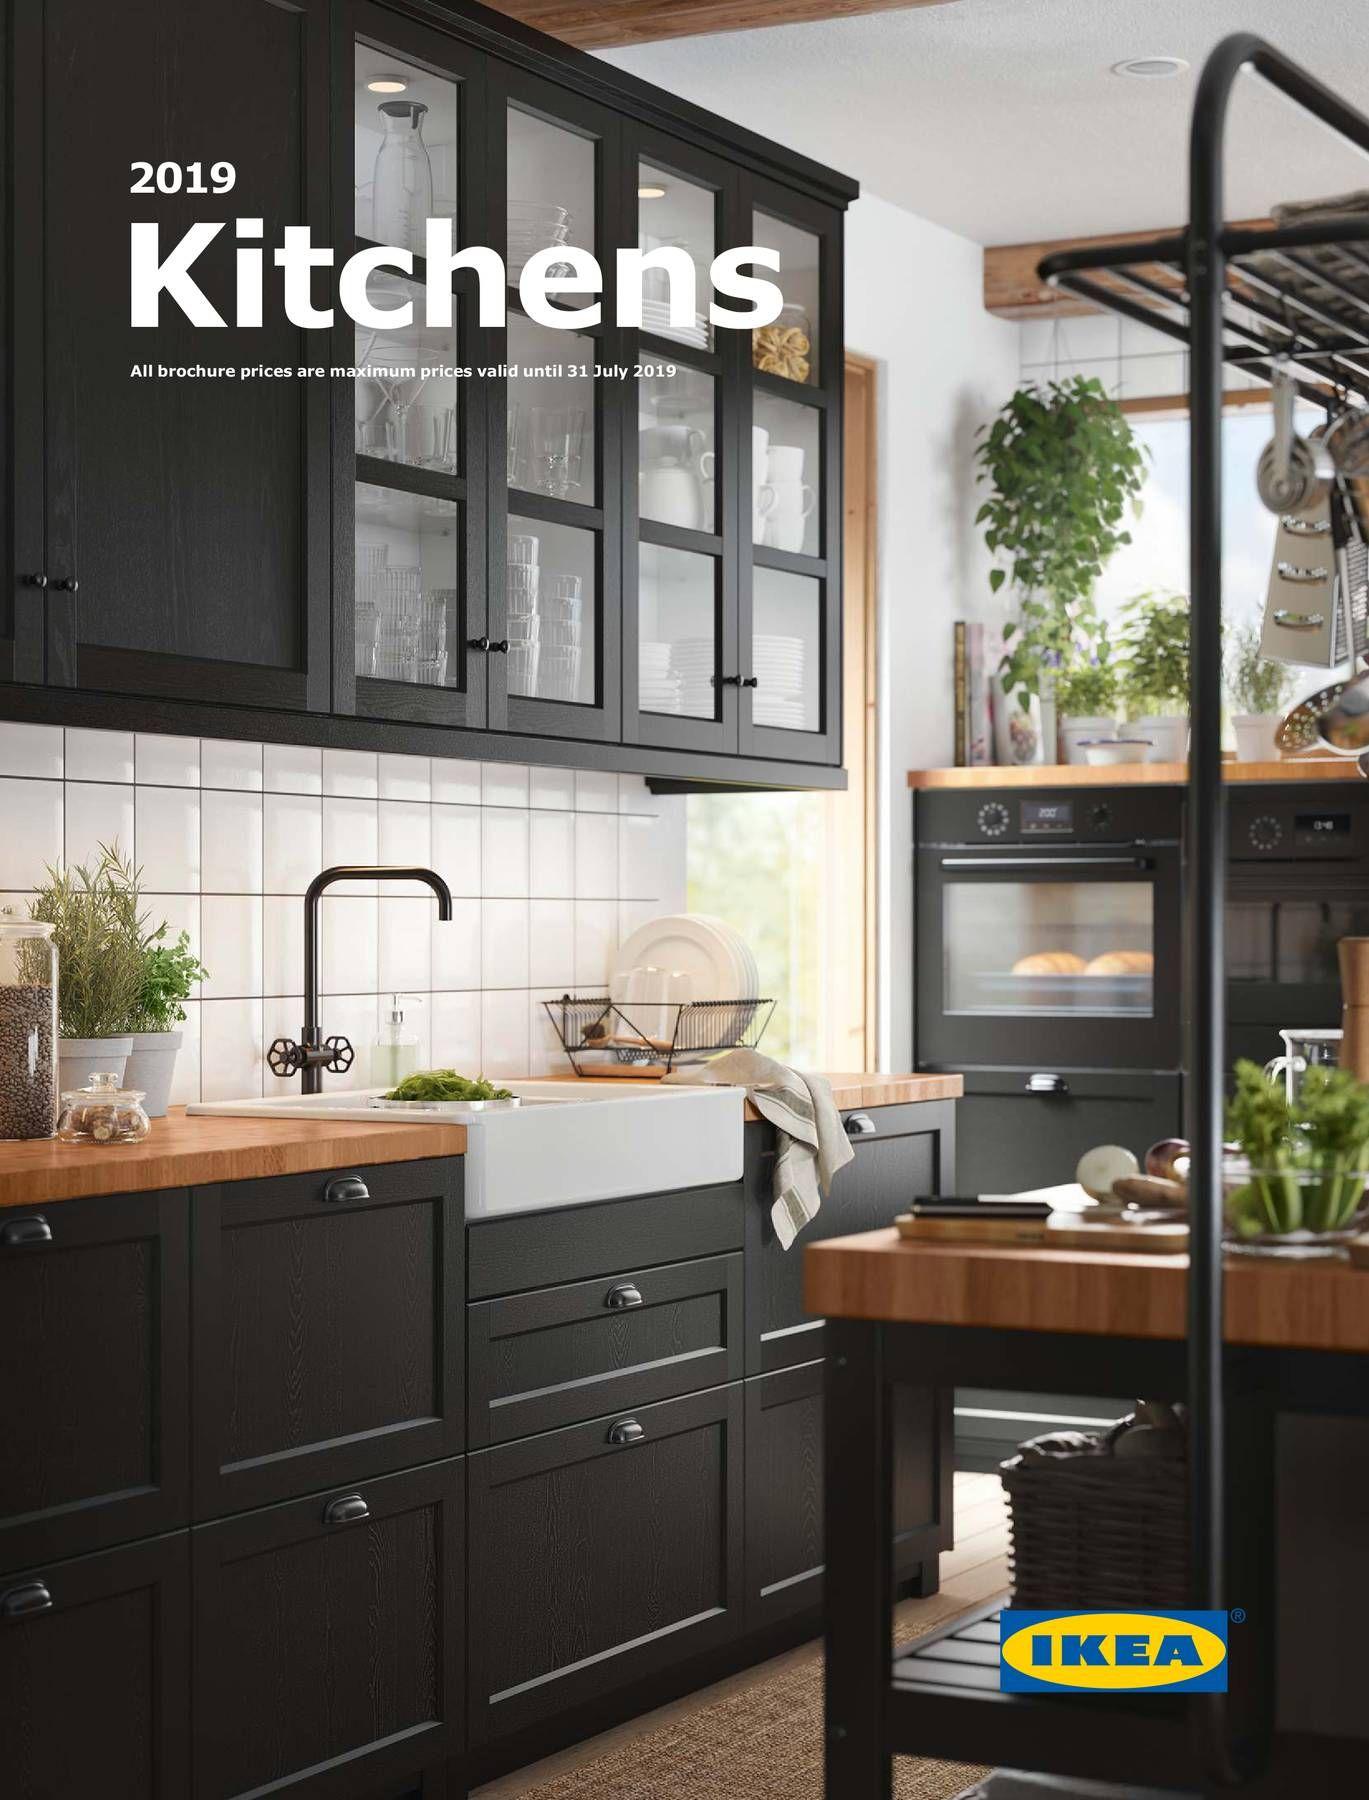 Awesome Ikea Kitchens 2019 Ideas